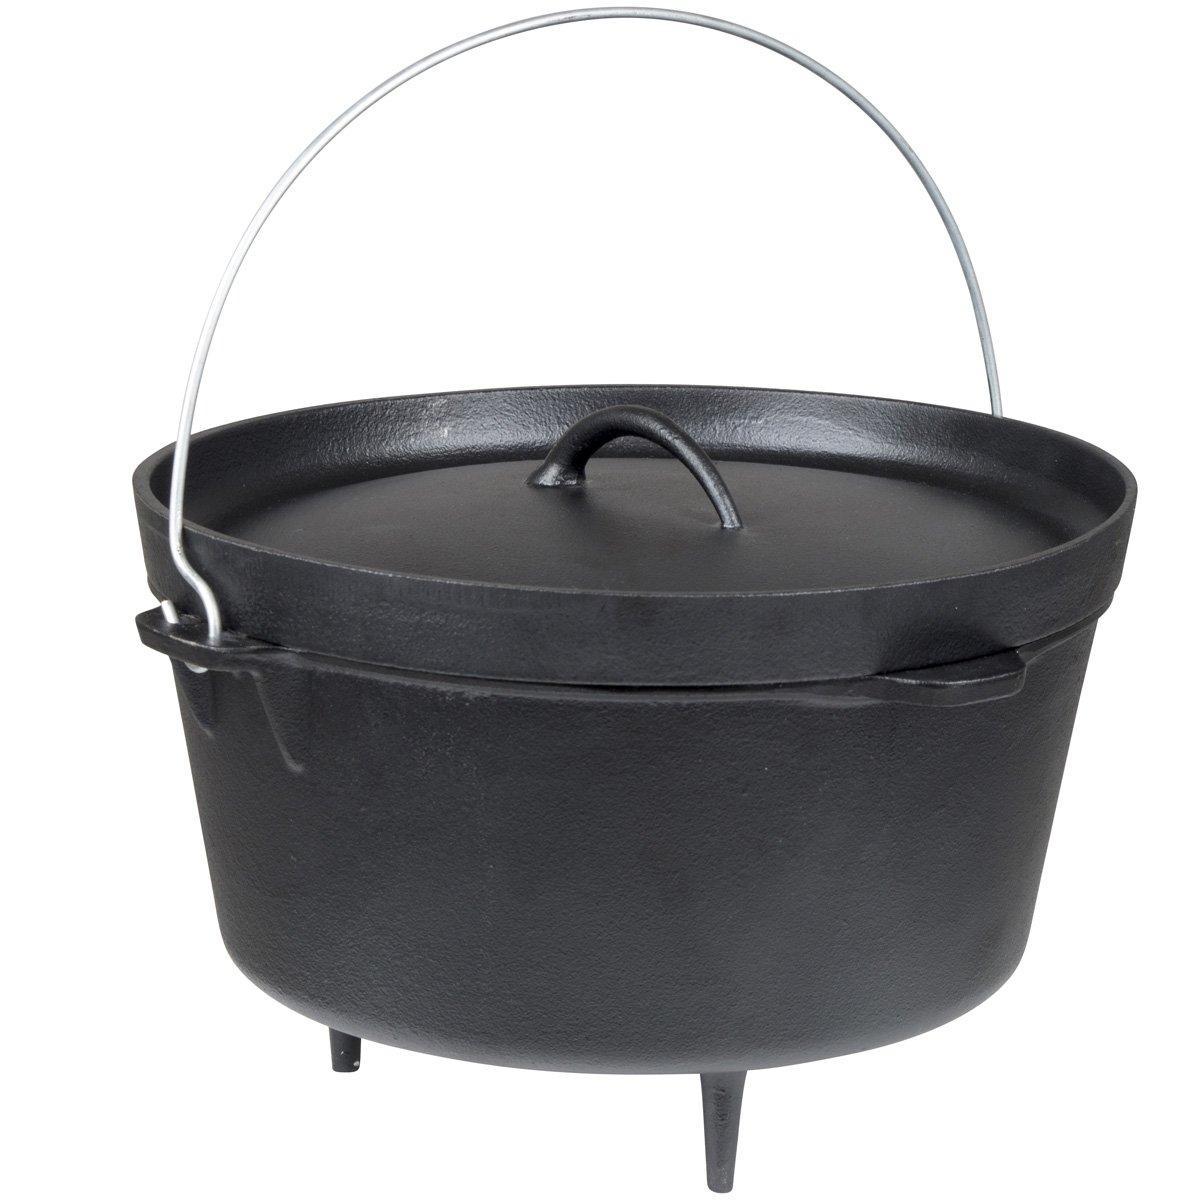 Dutch Oven Feuertopf aus Gusseisen vielseitig anwendbar Durchmesser ca. 31 cm • Schmortopf Römertopf Grill Topf Bräter Camping